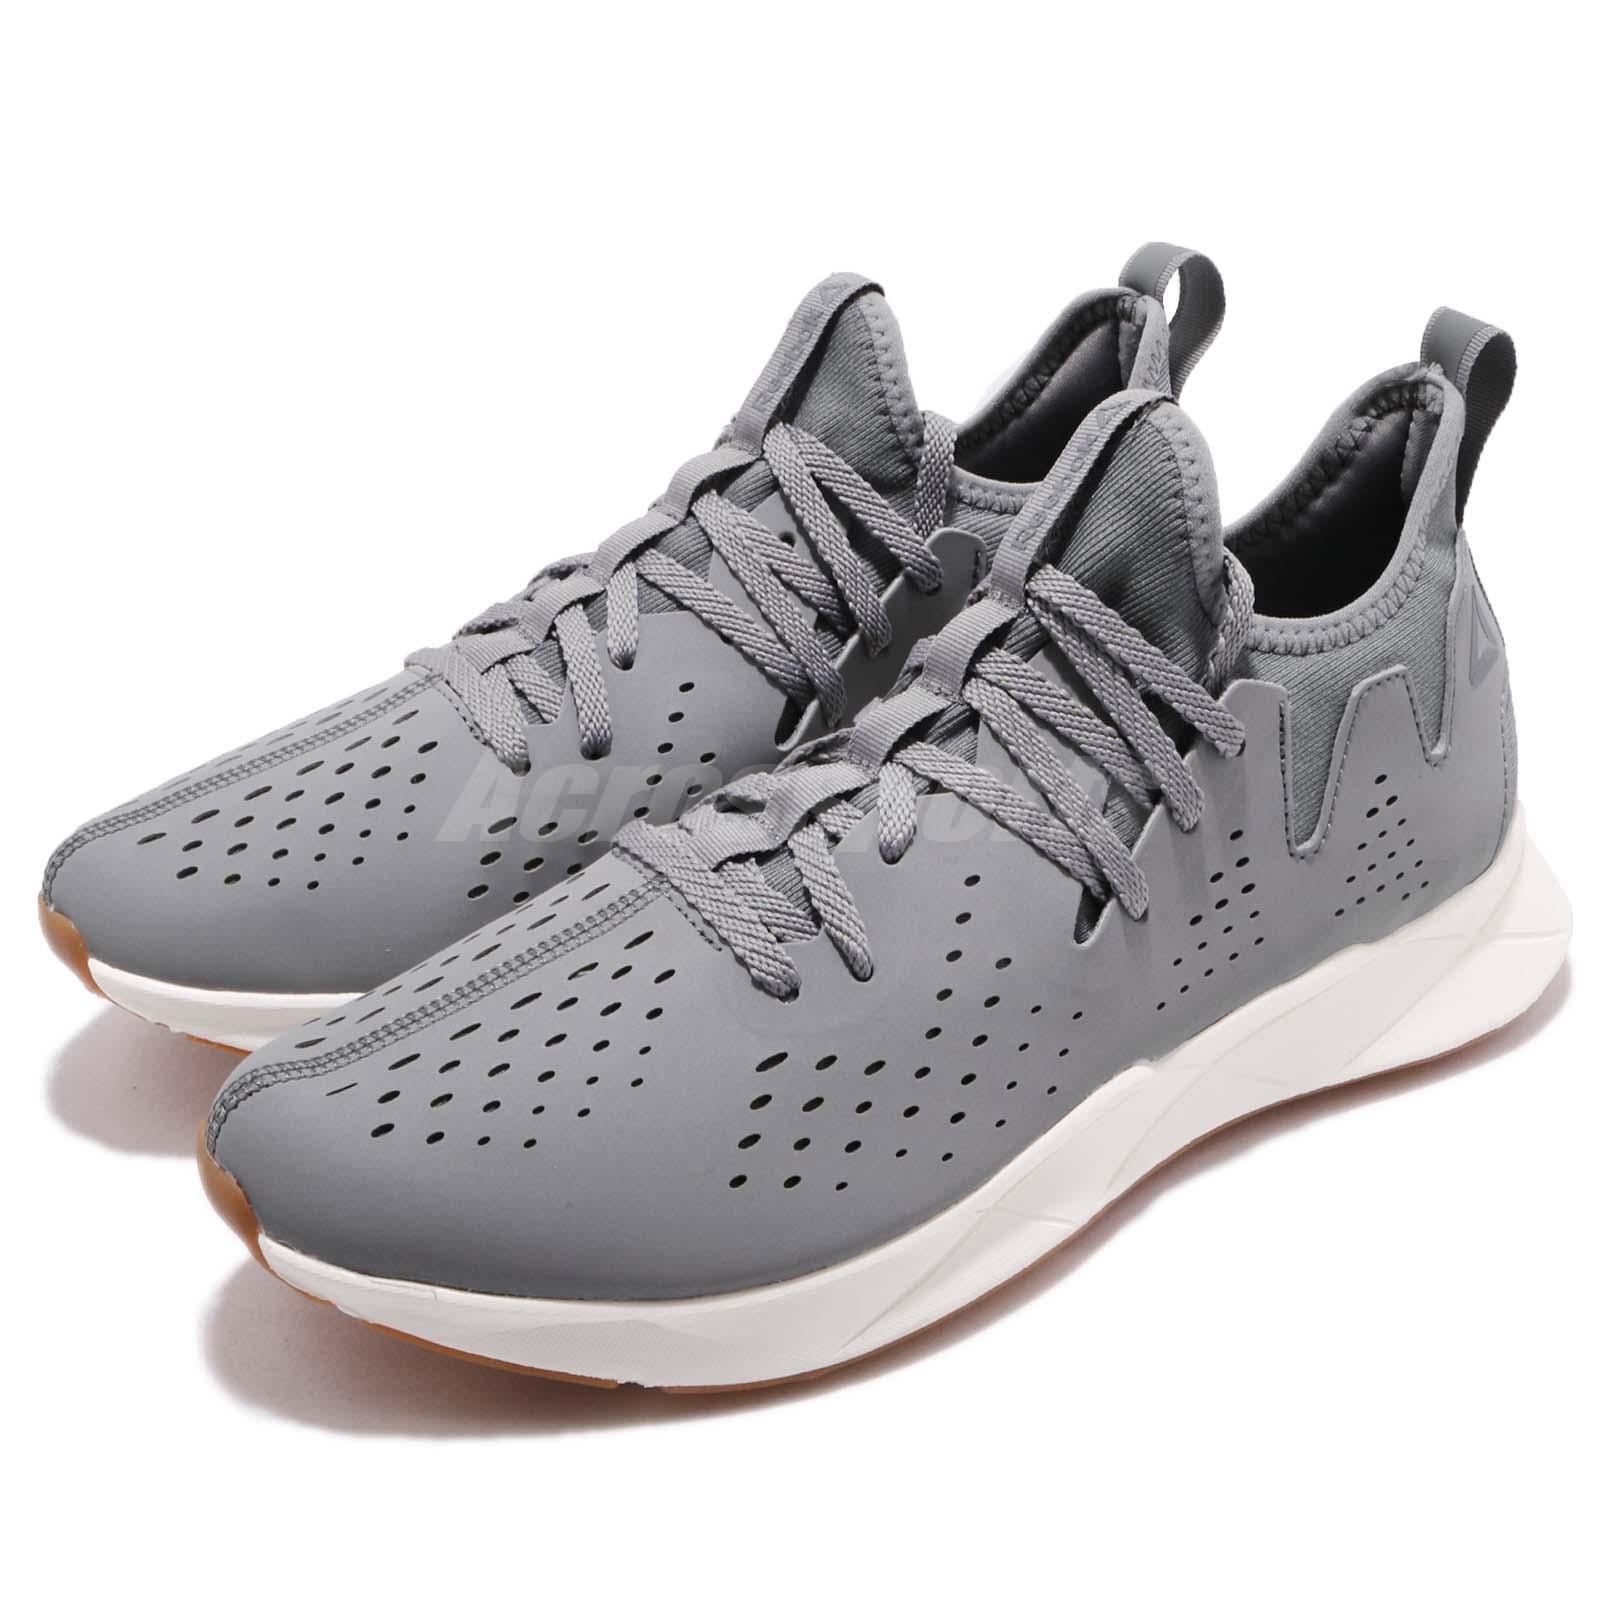 Reebok Supreme Runner Foggy Grey Chalk Gum Men Running shoes Sneakers CN2916